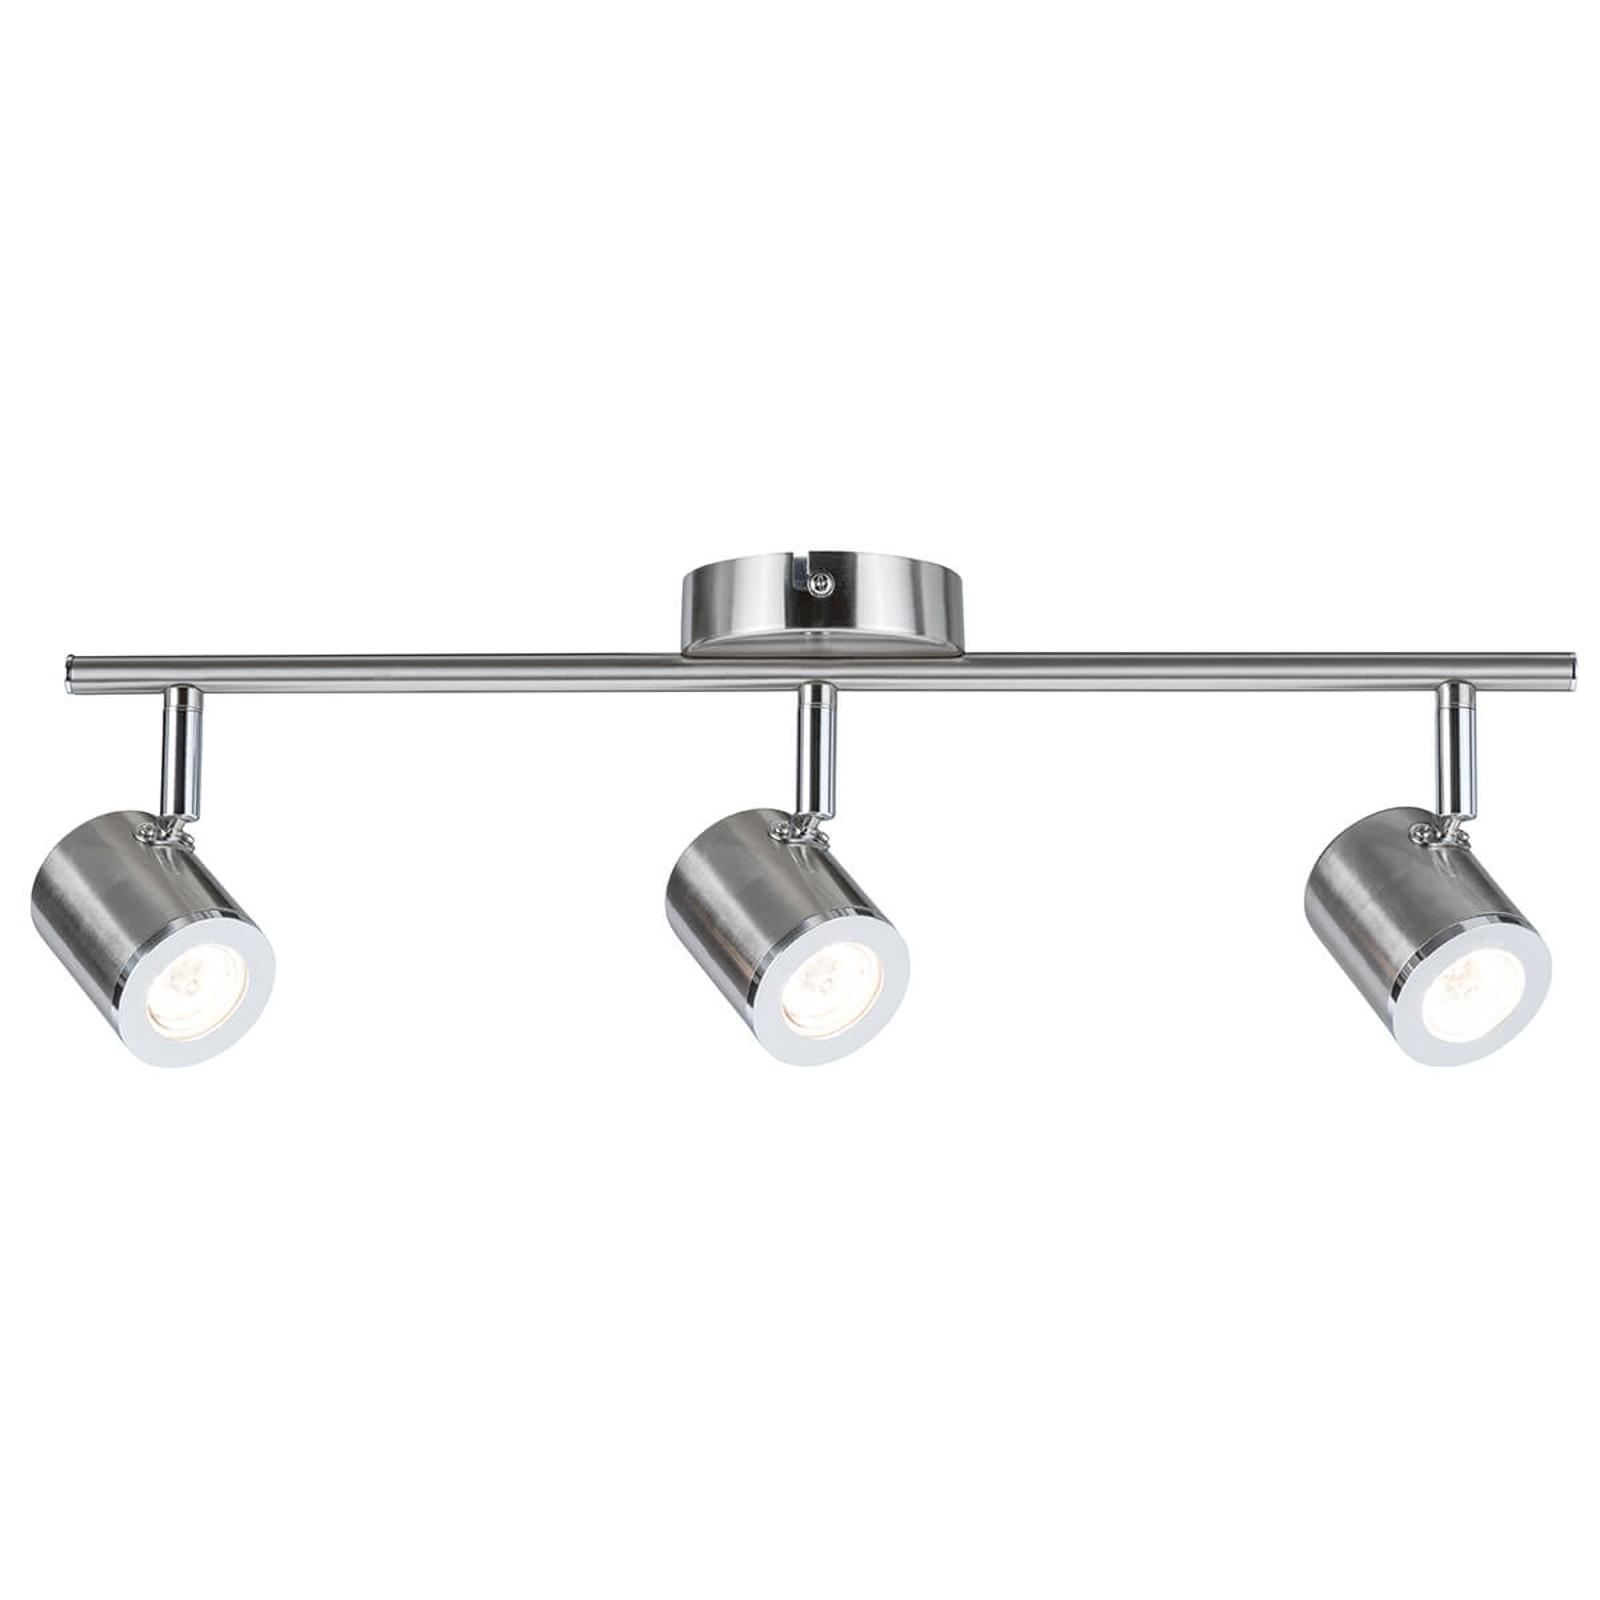 3-punktowa lampa sufitowa LED Tumbler